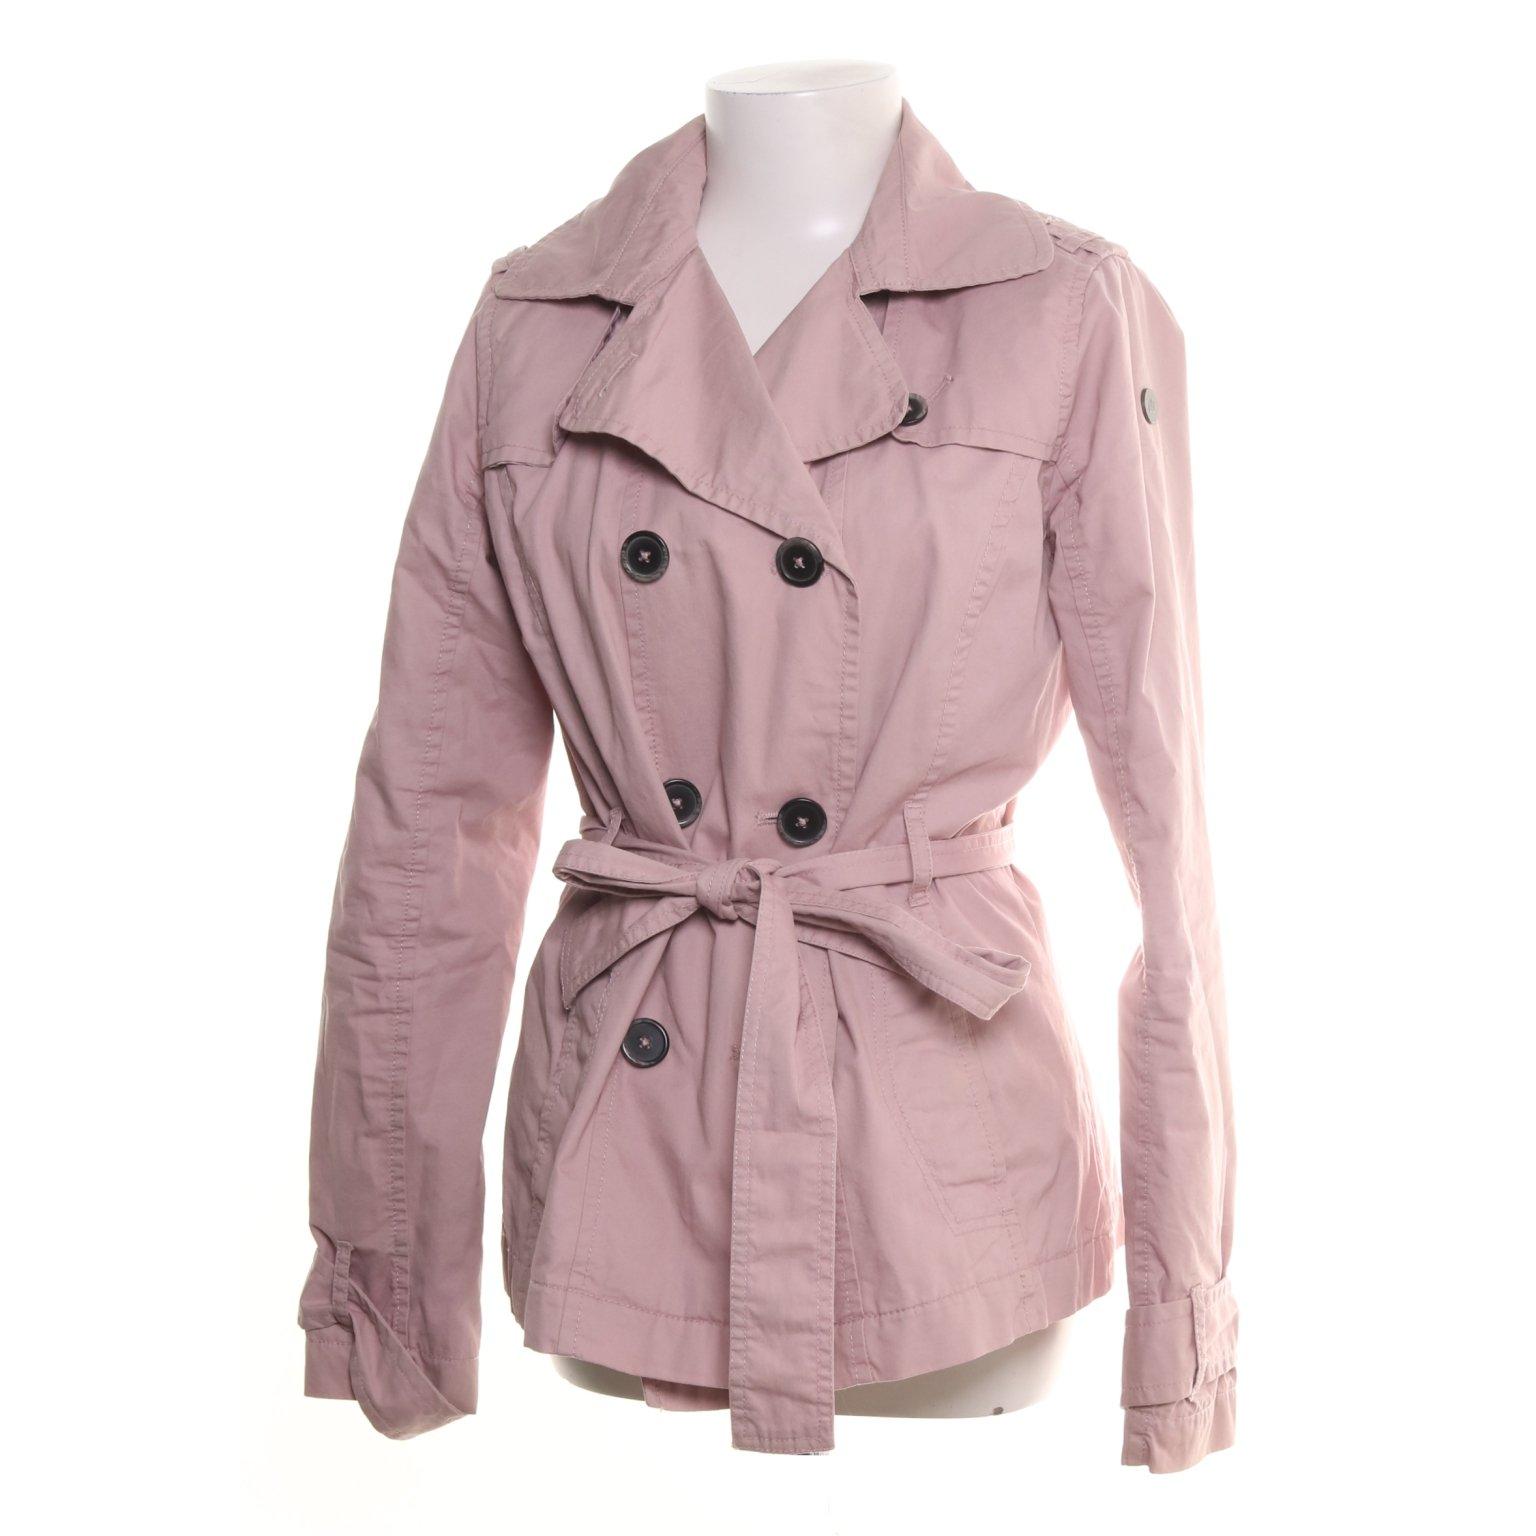 timeless design 6e393 535c1 s oliver rosa rohdepaul.club